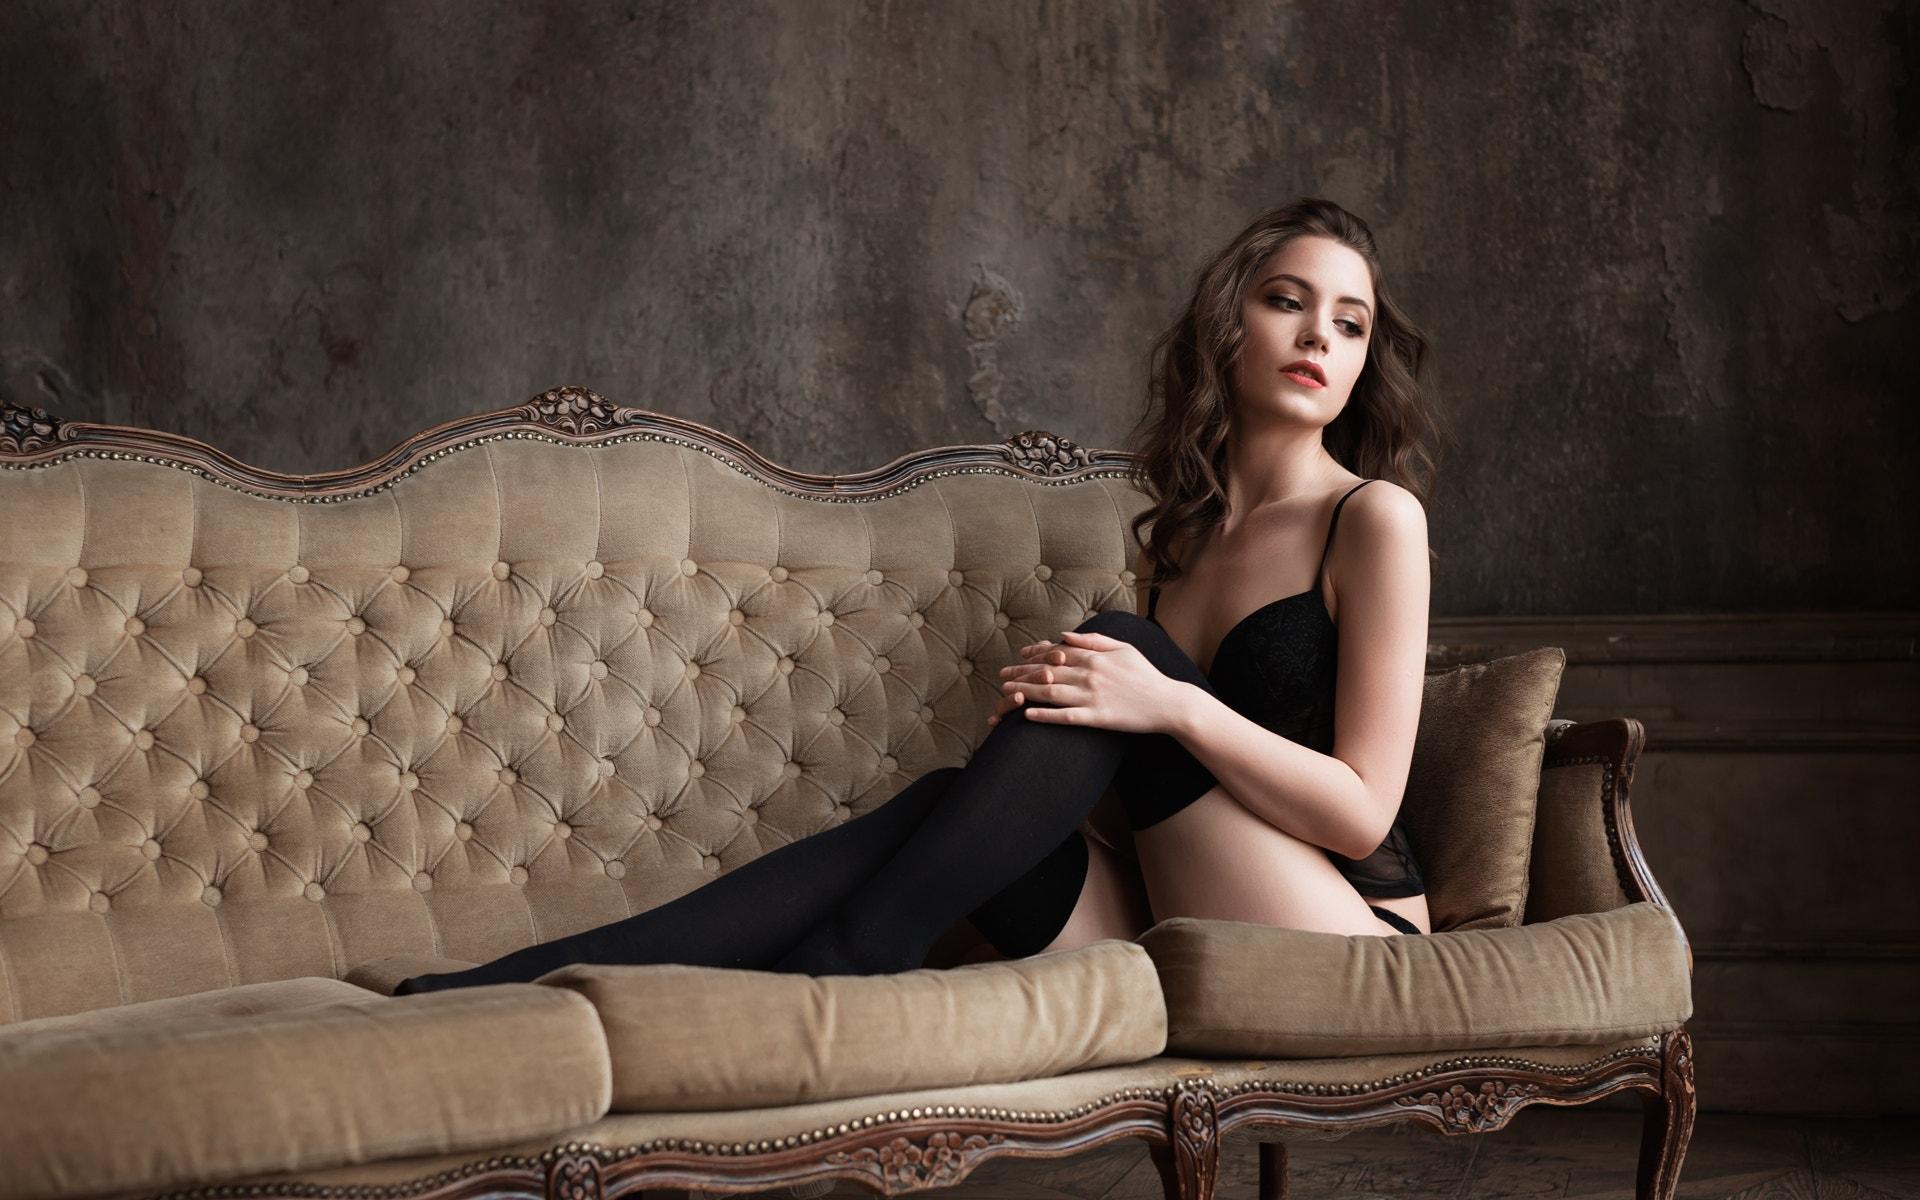 Wallpaper : women, portrait, black stockings, tattoo, high